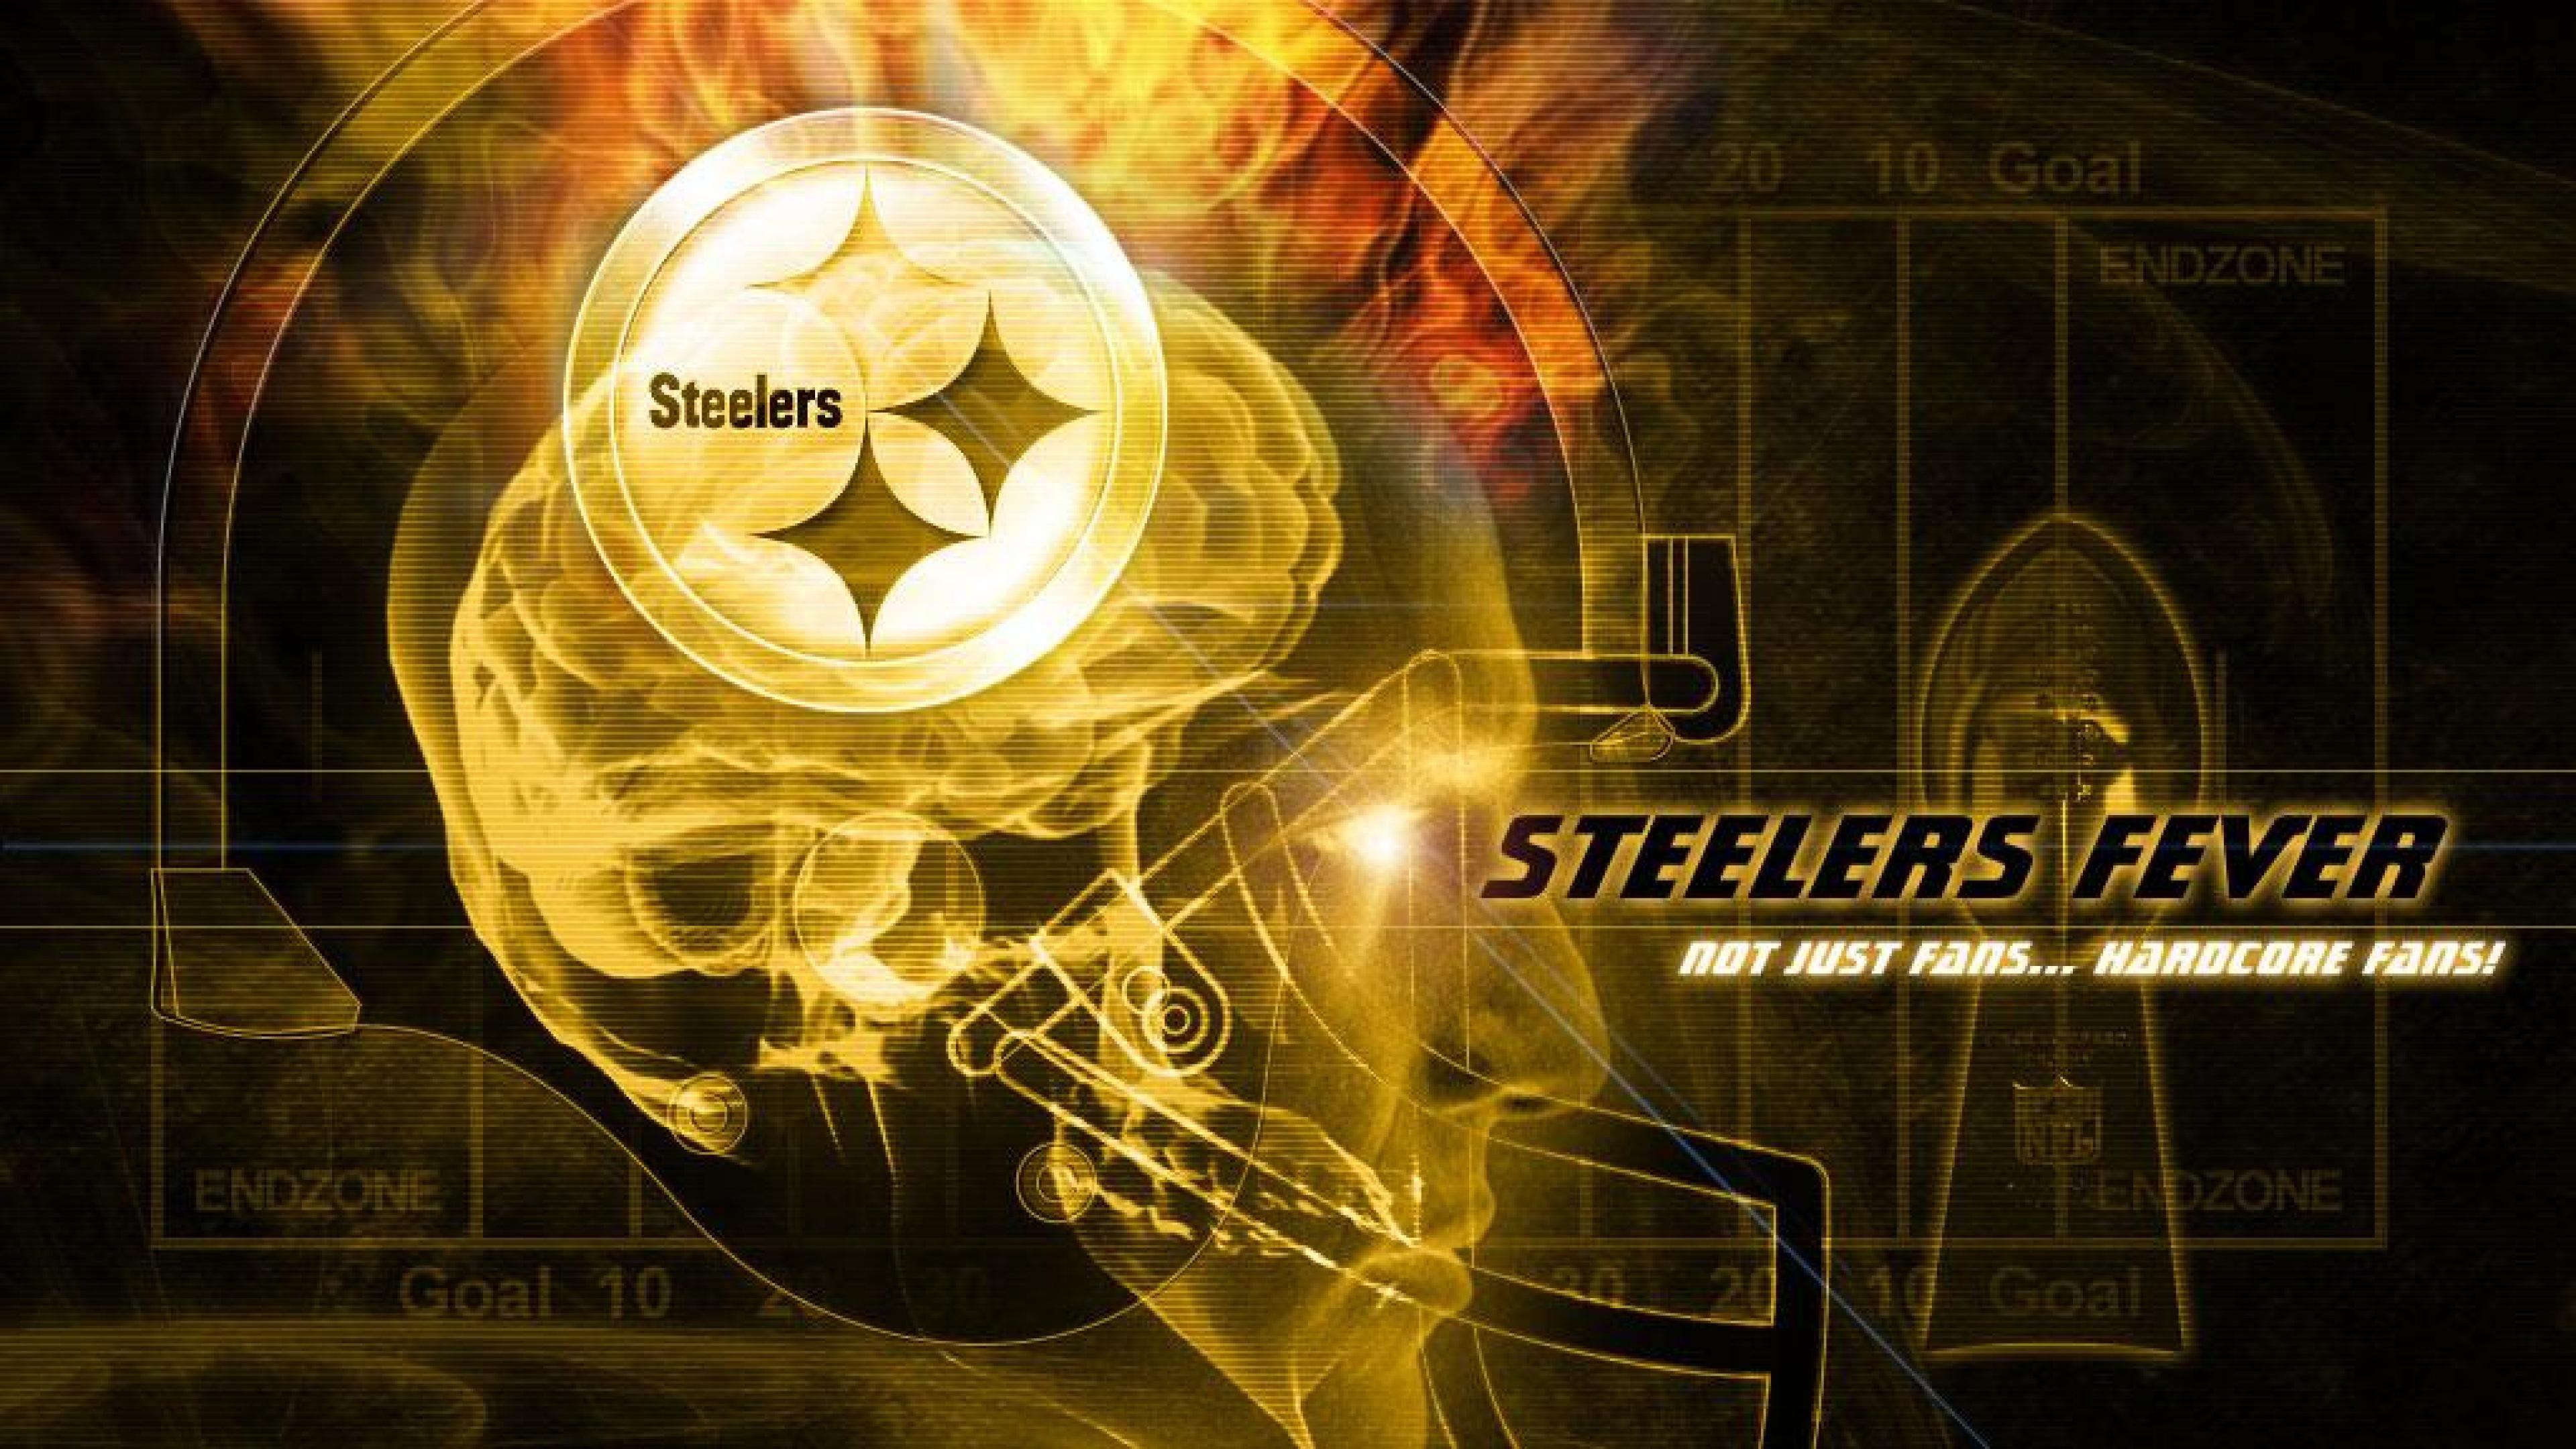 2000x1255 Steelers Wallpaper - FREE DOWNLOAD HD WALLPAPERS